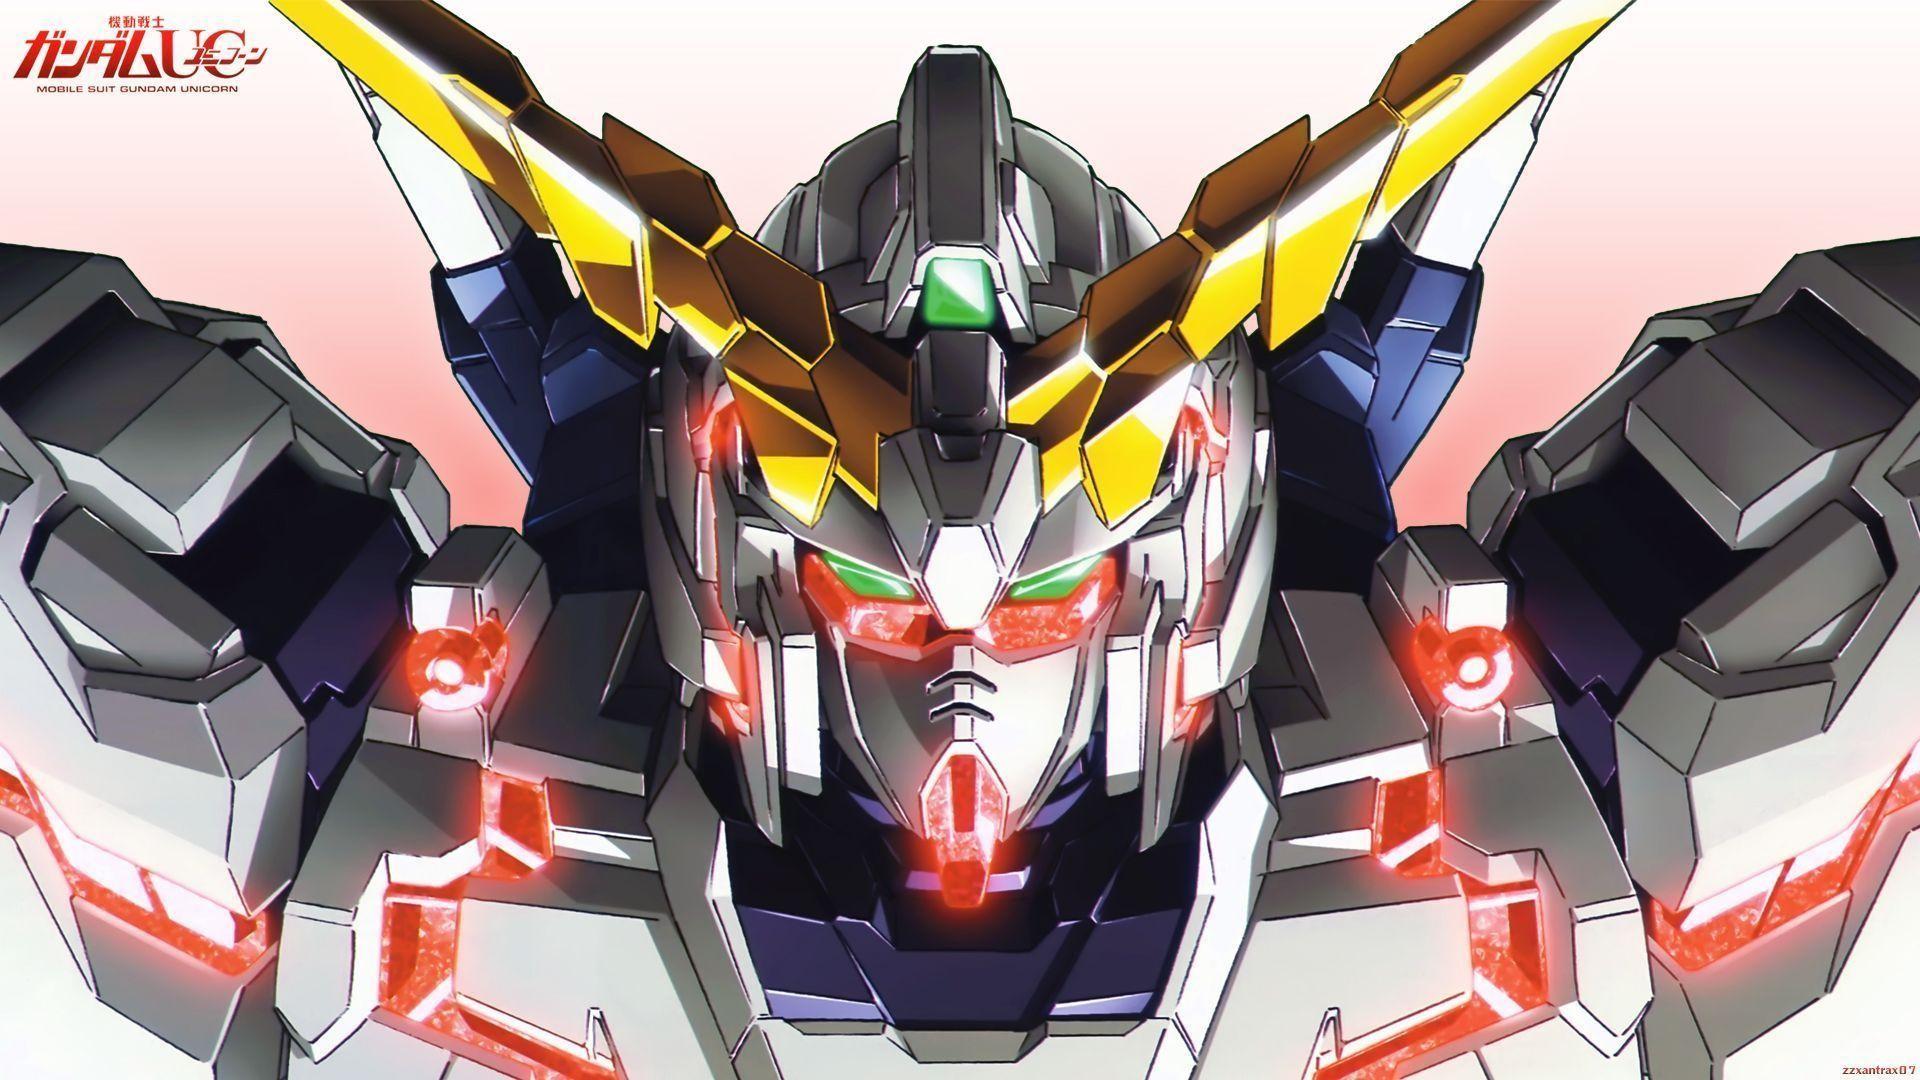 Gundam Wallpapers – 3 | Wallpapers